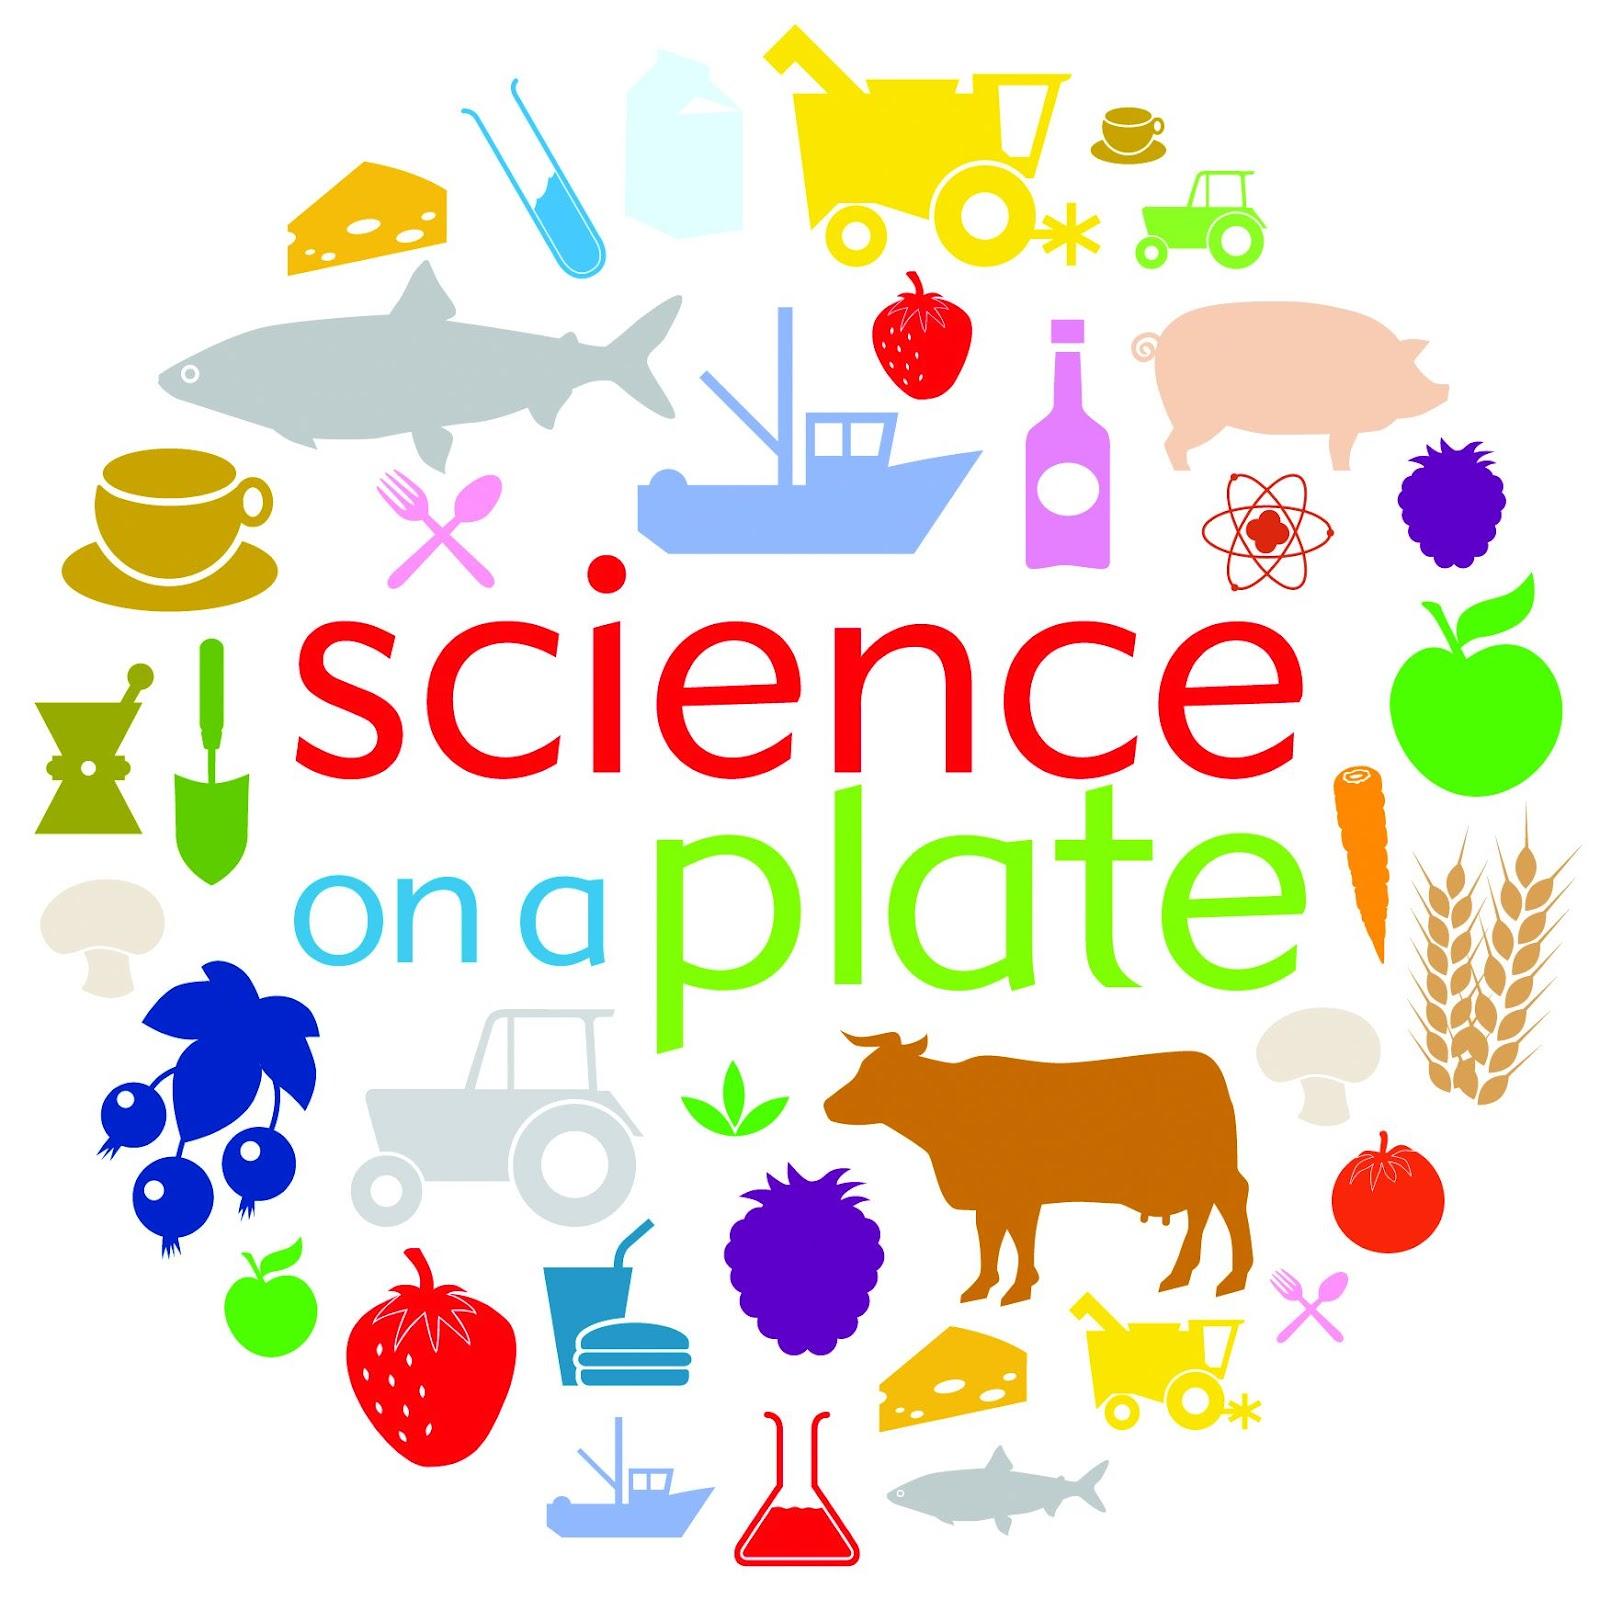 science plate nutrition food edinburgh europe bhl aberdeen university taken should exhibition scientists served circle rowett abdn ac